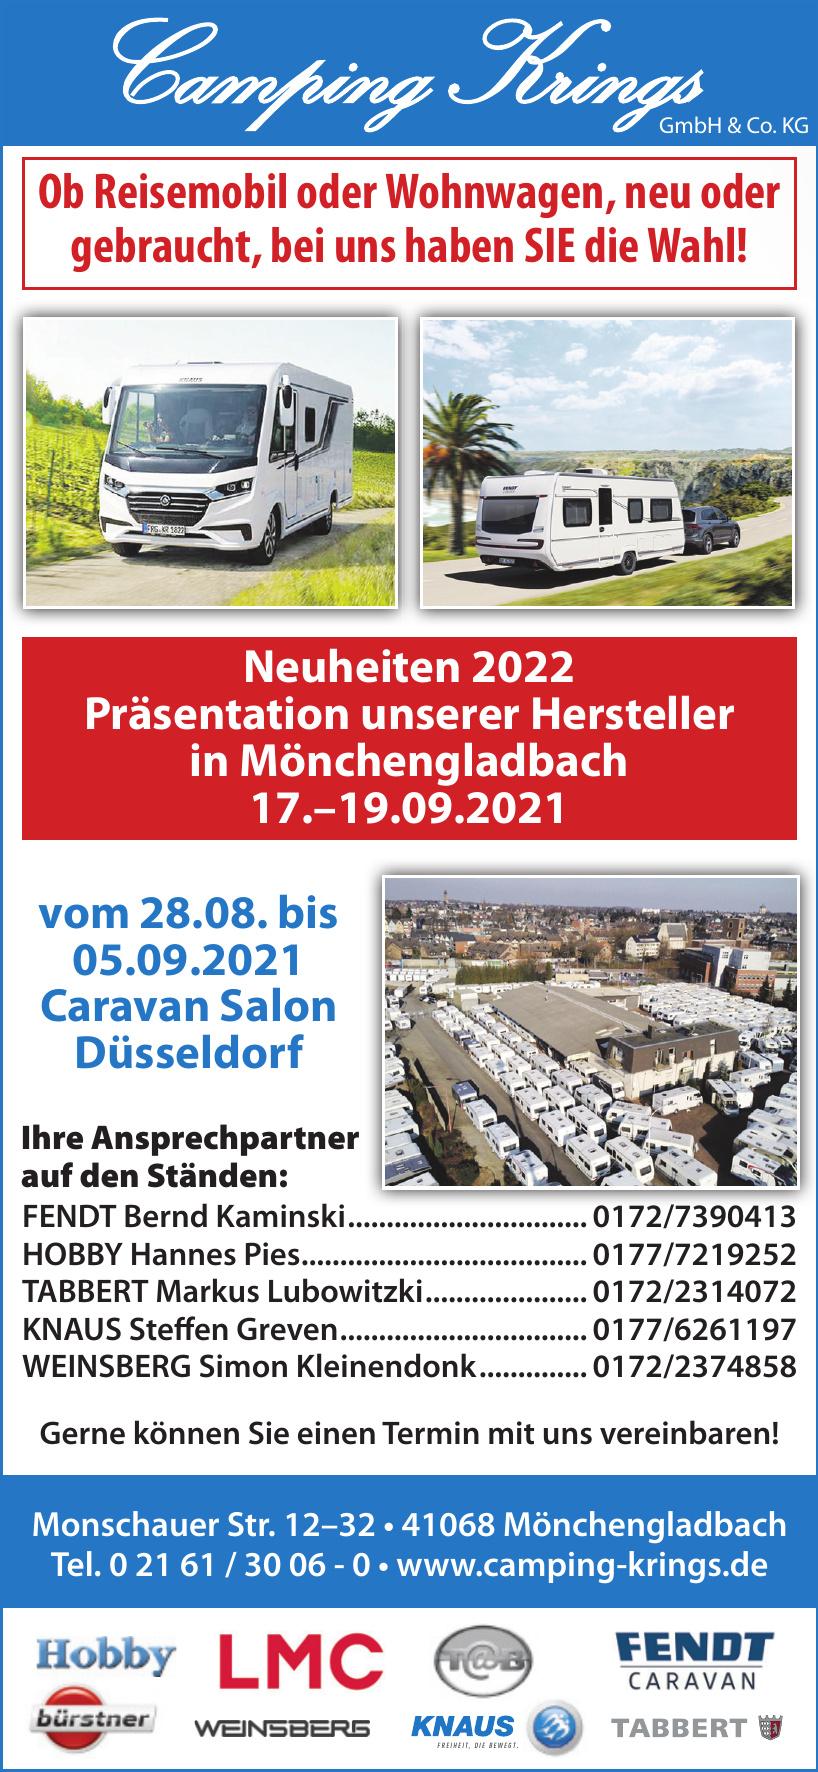 Camping Krings GmbH & Co. KG